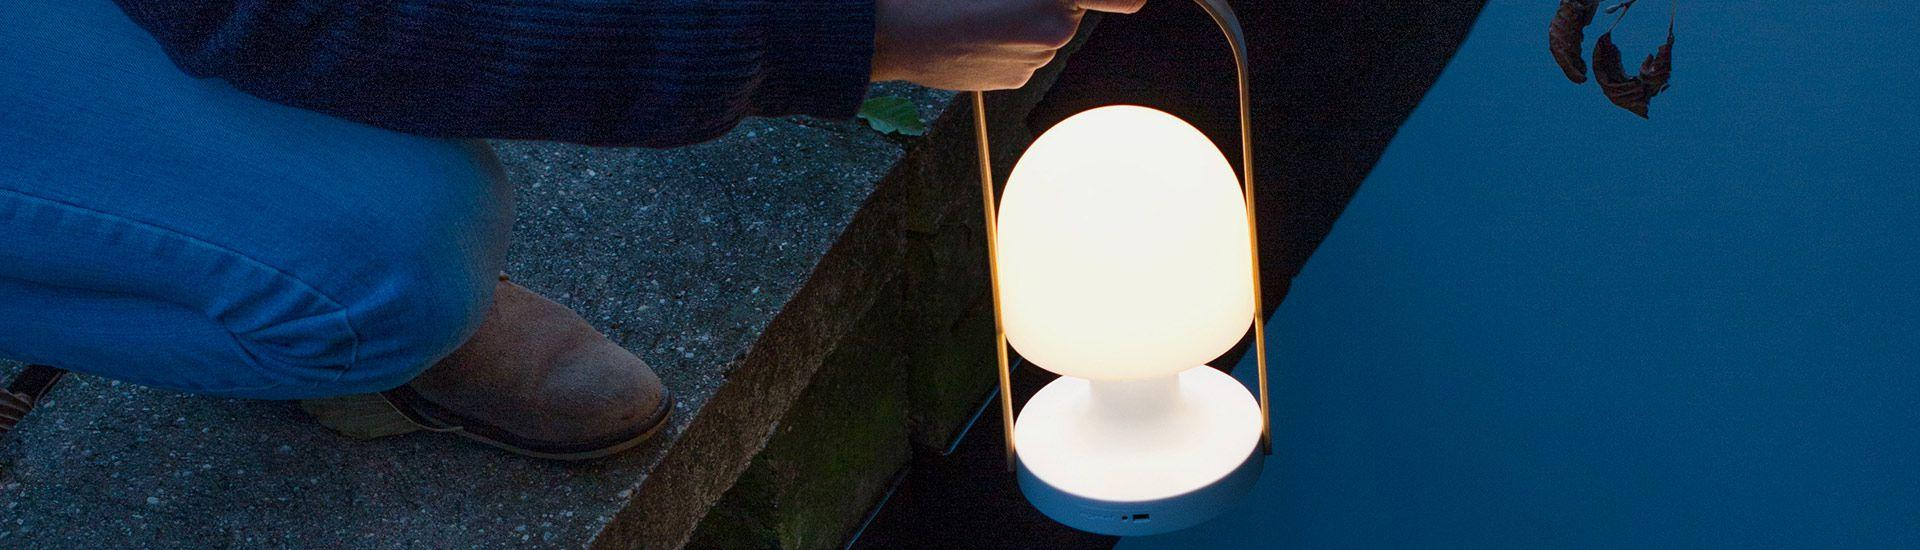 Santorini Lampada a sospensione E27 LED Classic 8W bianco